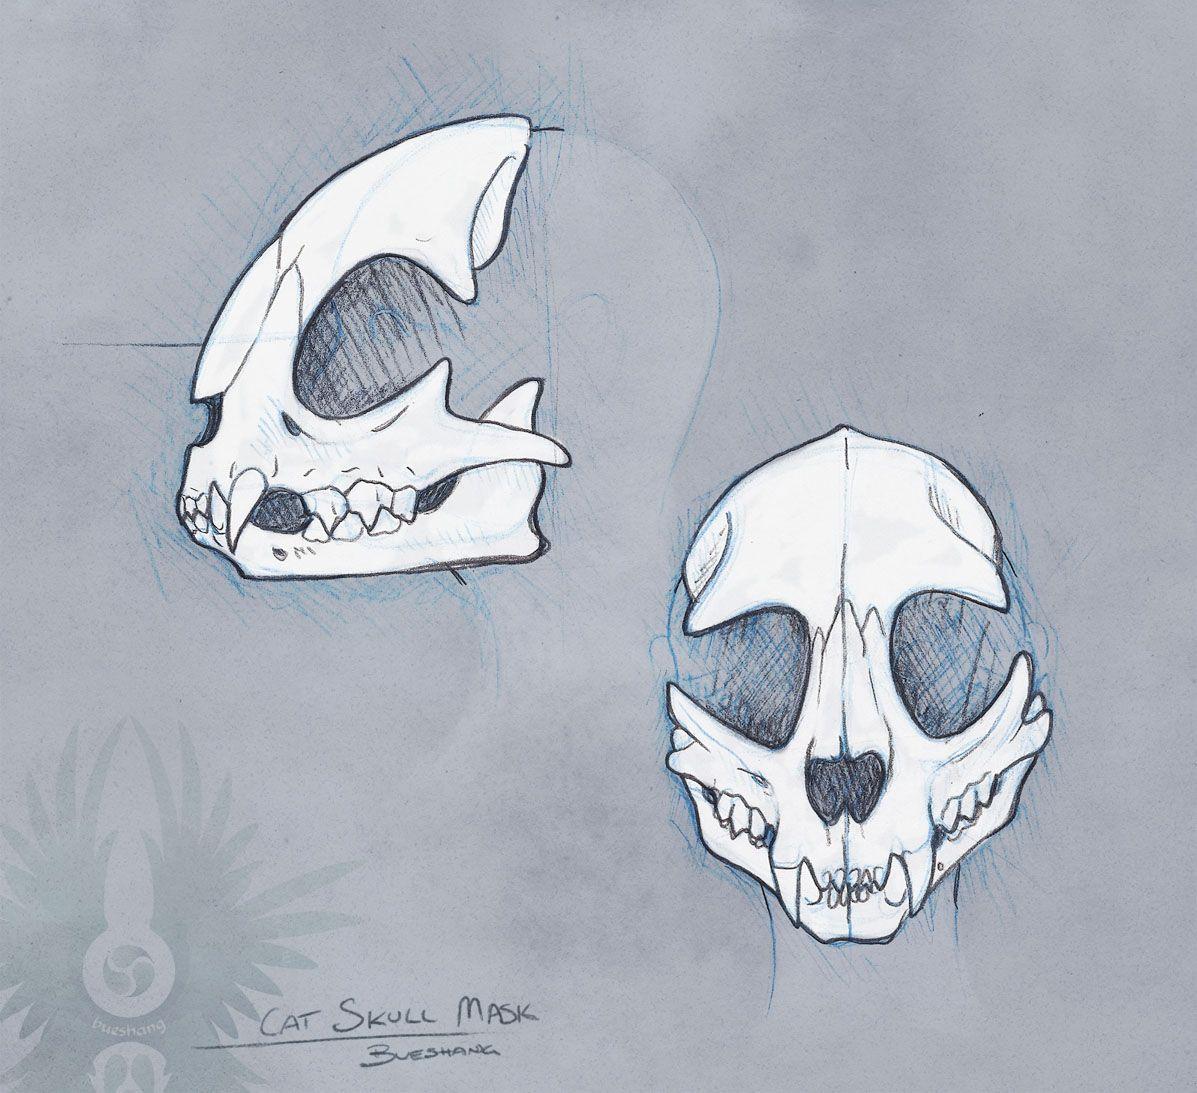 Sketch Cat Skull Mask By Bueshang D6xf47i Jpg 1197 1093 Cat Skull Mask Drawing Skull Mask